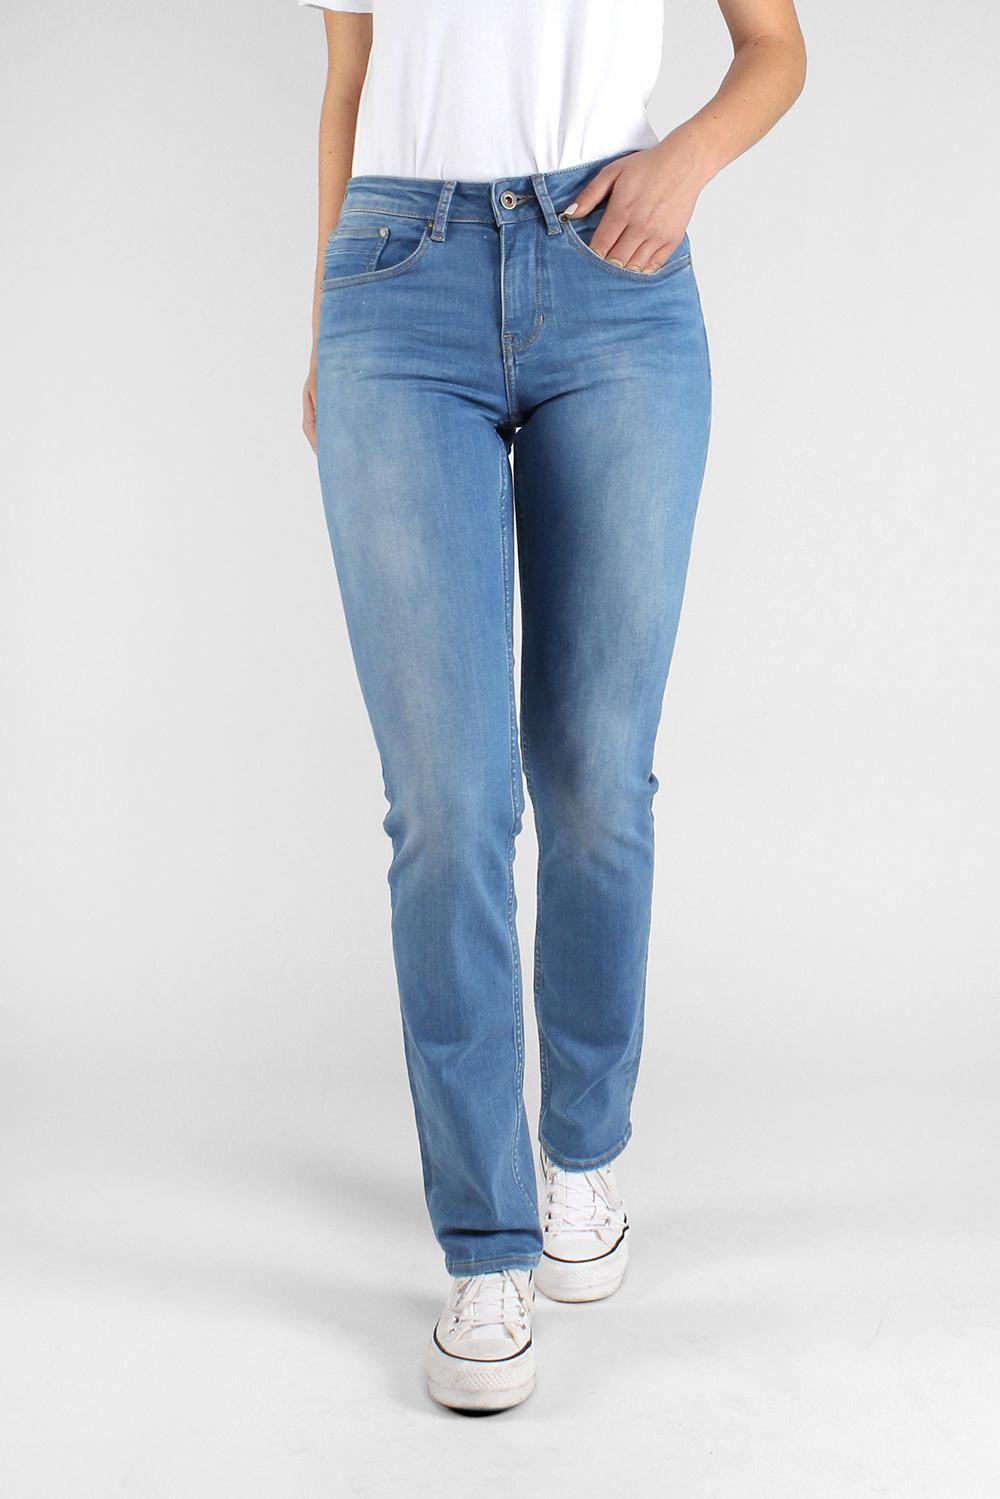 Jeans Droit Sara - Kuyichi